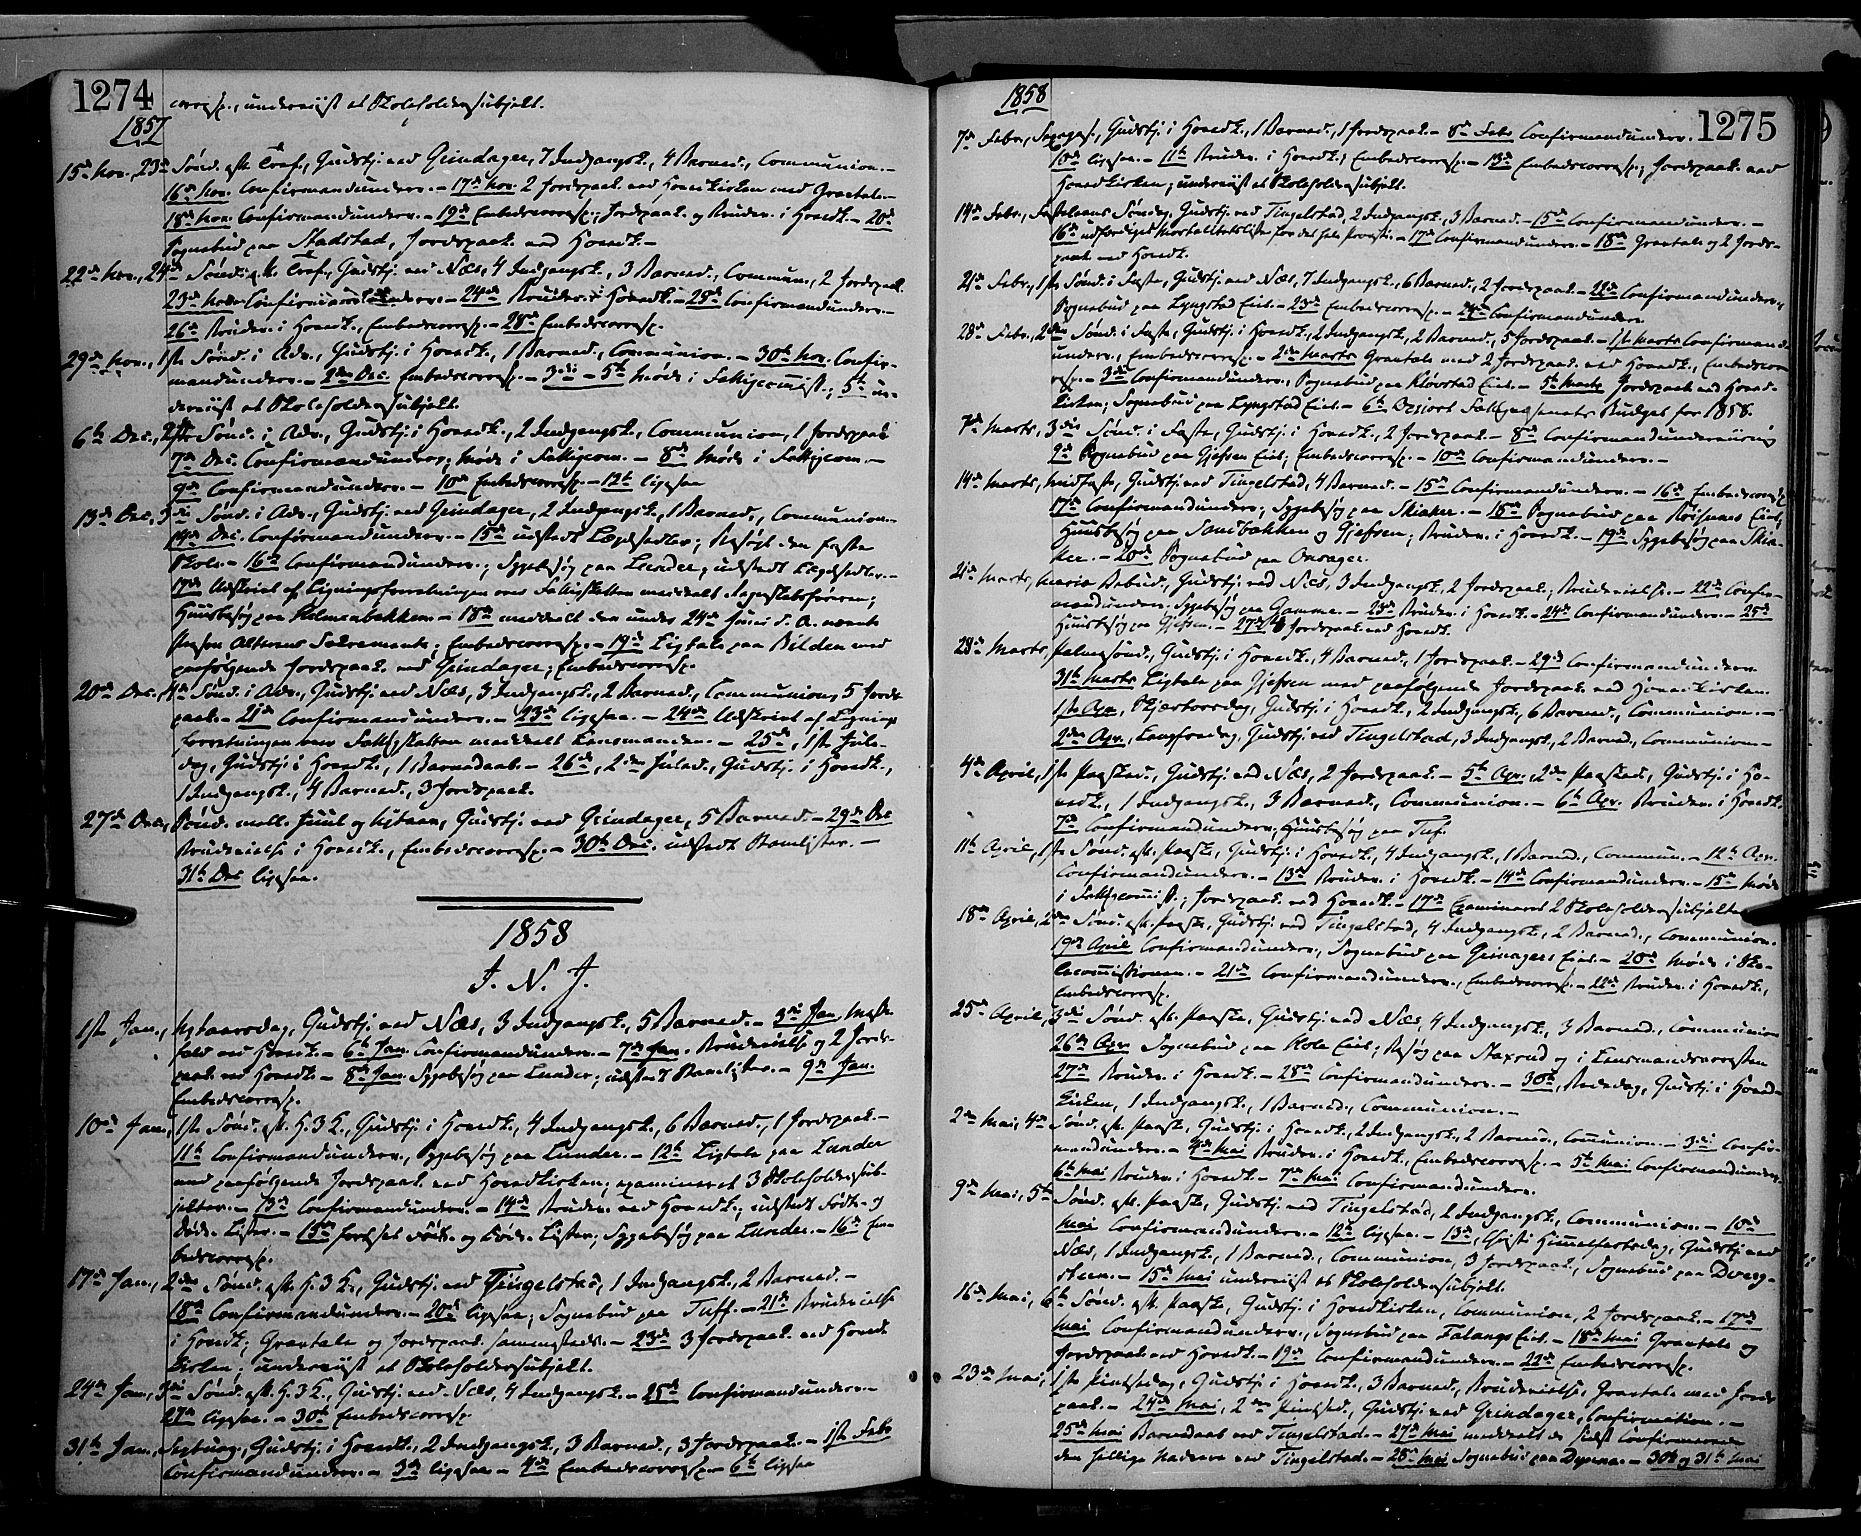 SAH, Gran prestekontor, Ministerialbok nr. 12, 1856-1874, s. 1274-1275